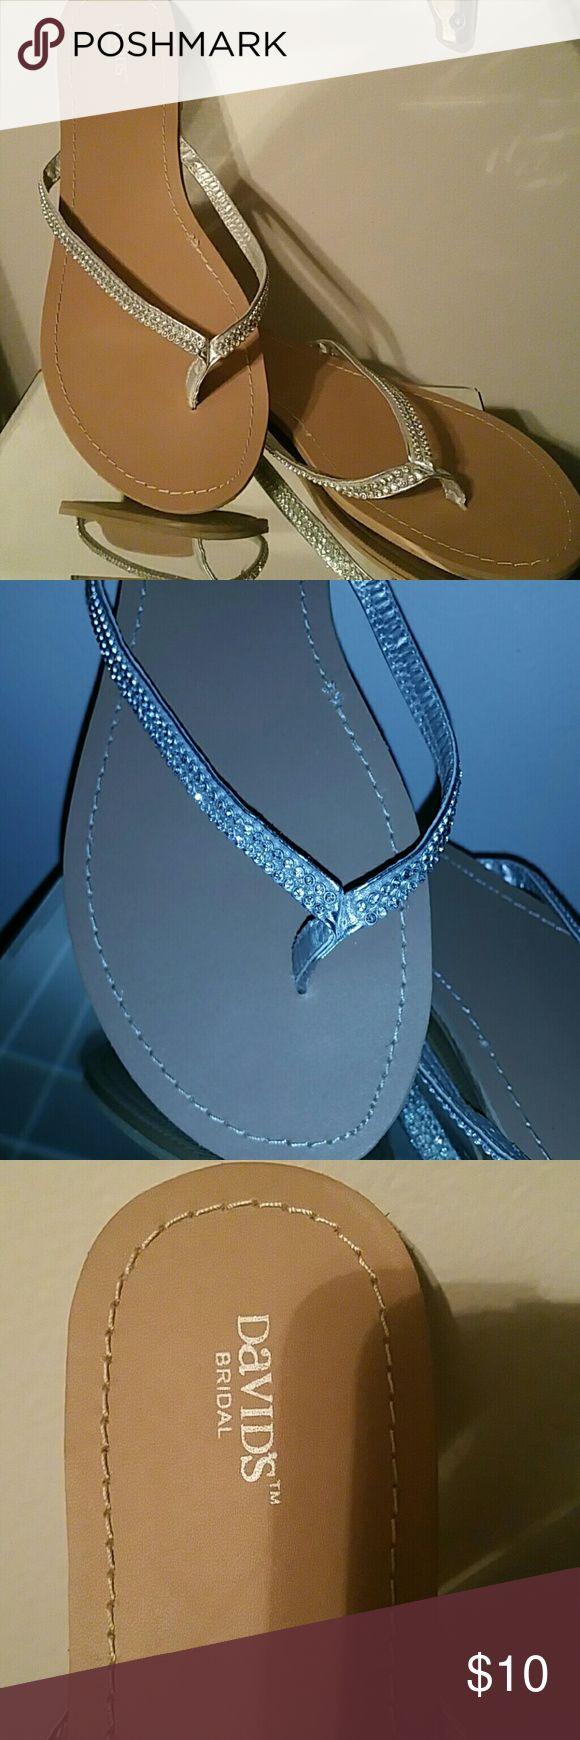 Bridal flip flops. Silver flip flops with bling. Purchased at Davids Bridal. Only worn 2 hrs. David's Bridal Shoes Sandals